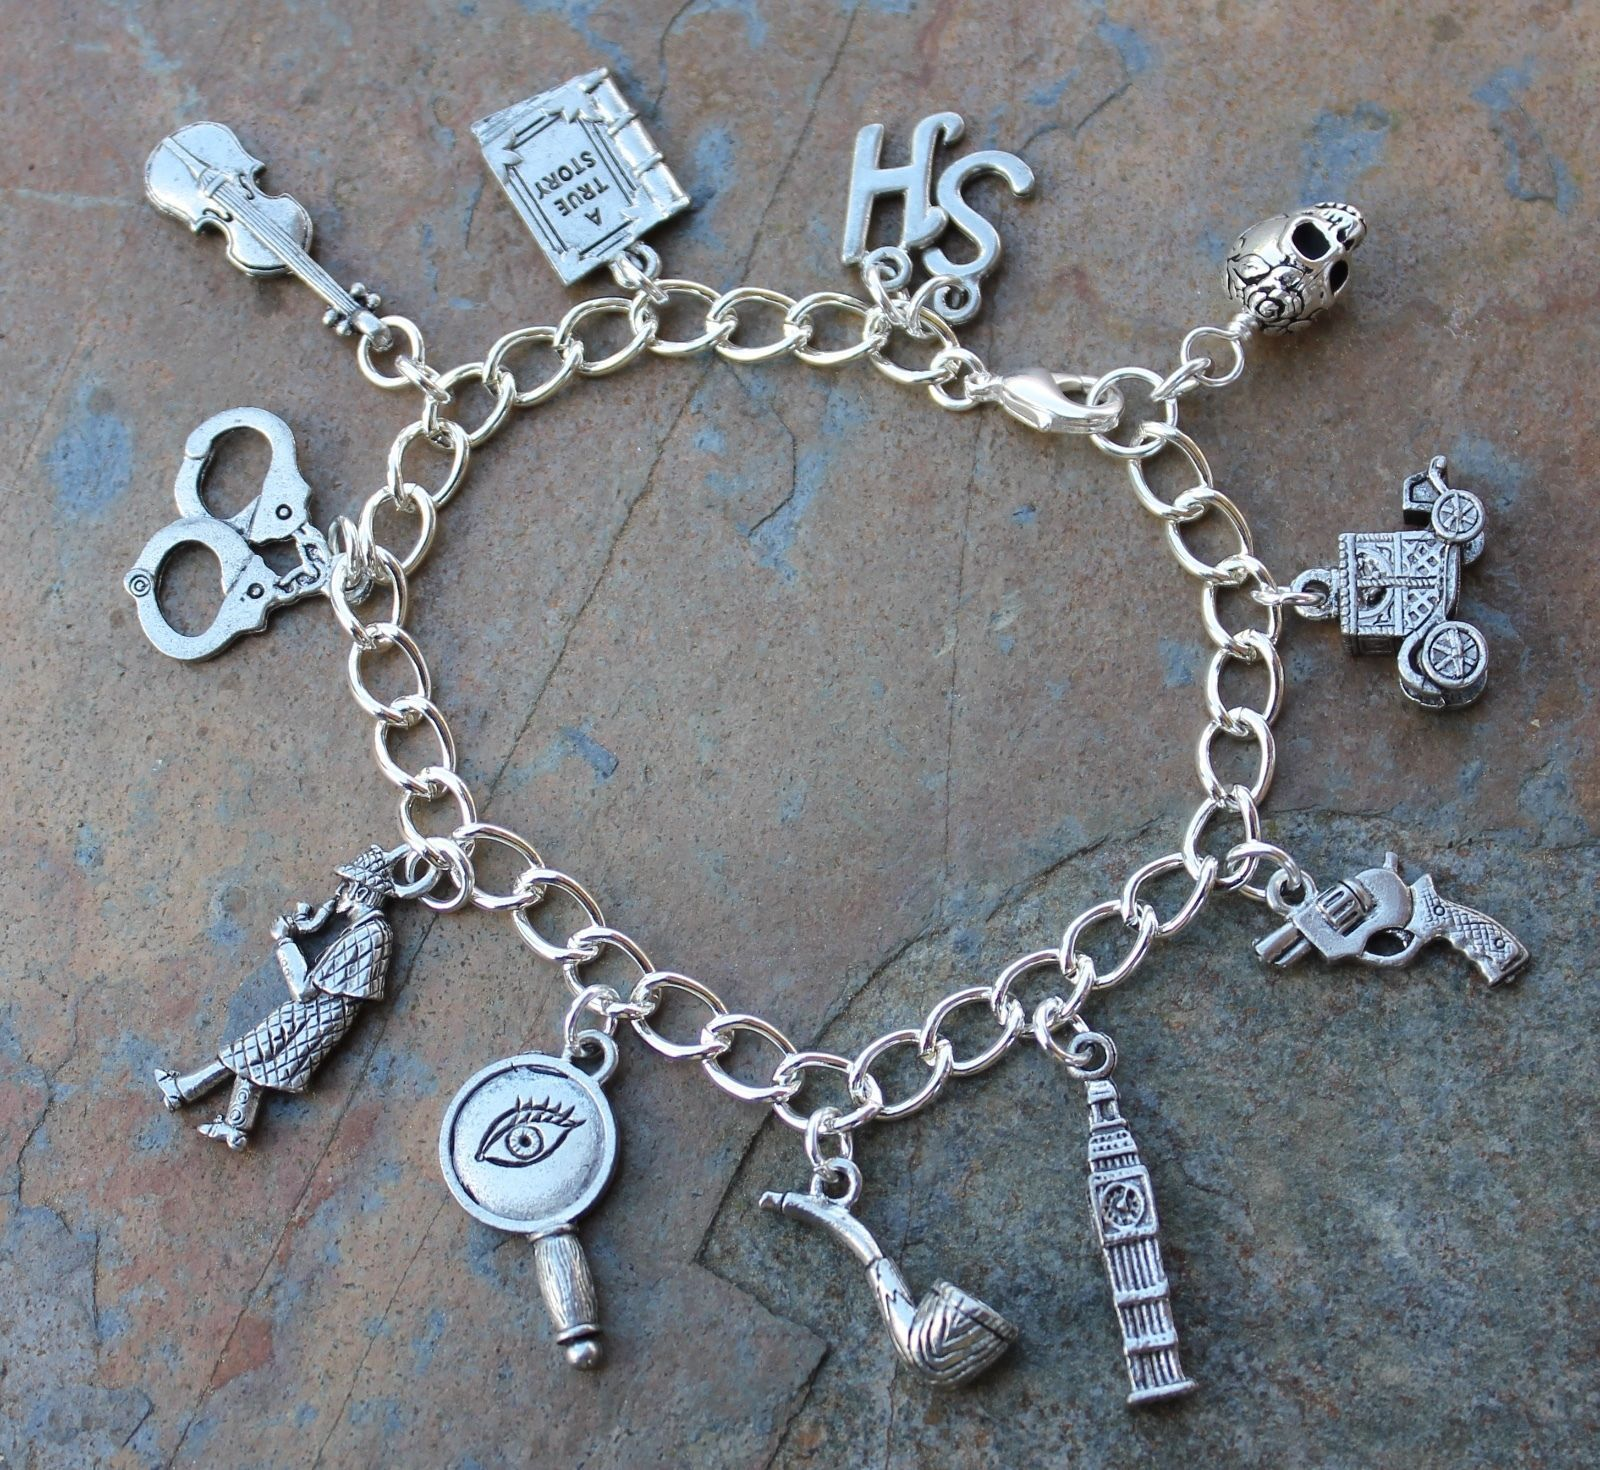 Details about Sherlock Holmes charm bracelet- mystery detective & London themed charms, fandom